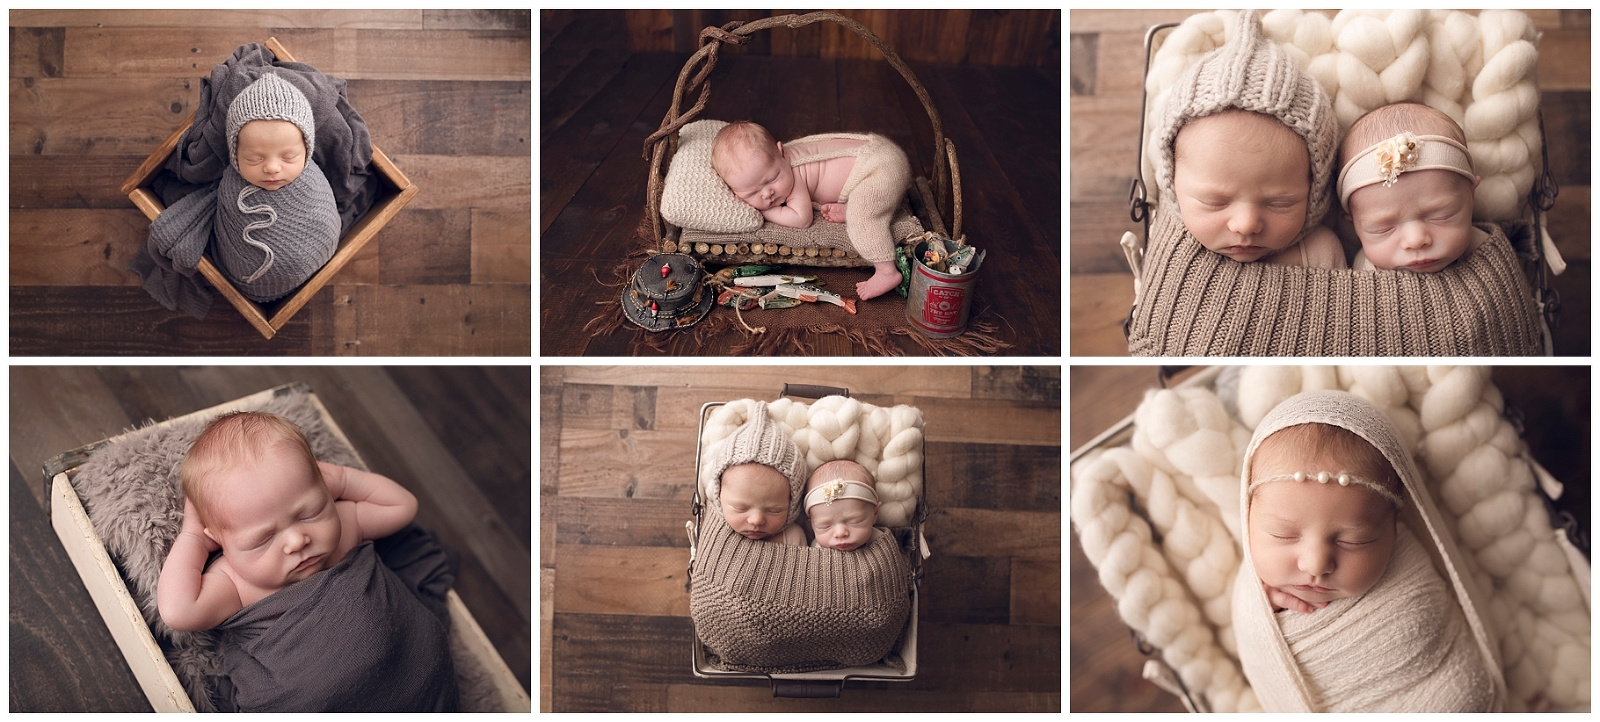 Quad Cities Newborn Photographer | Davenport Baby | Amanda Oakes Photography | www.amandaoakesphotography.com